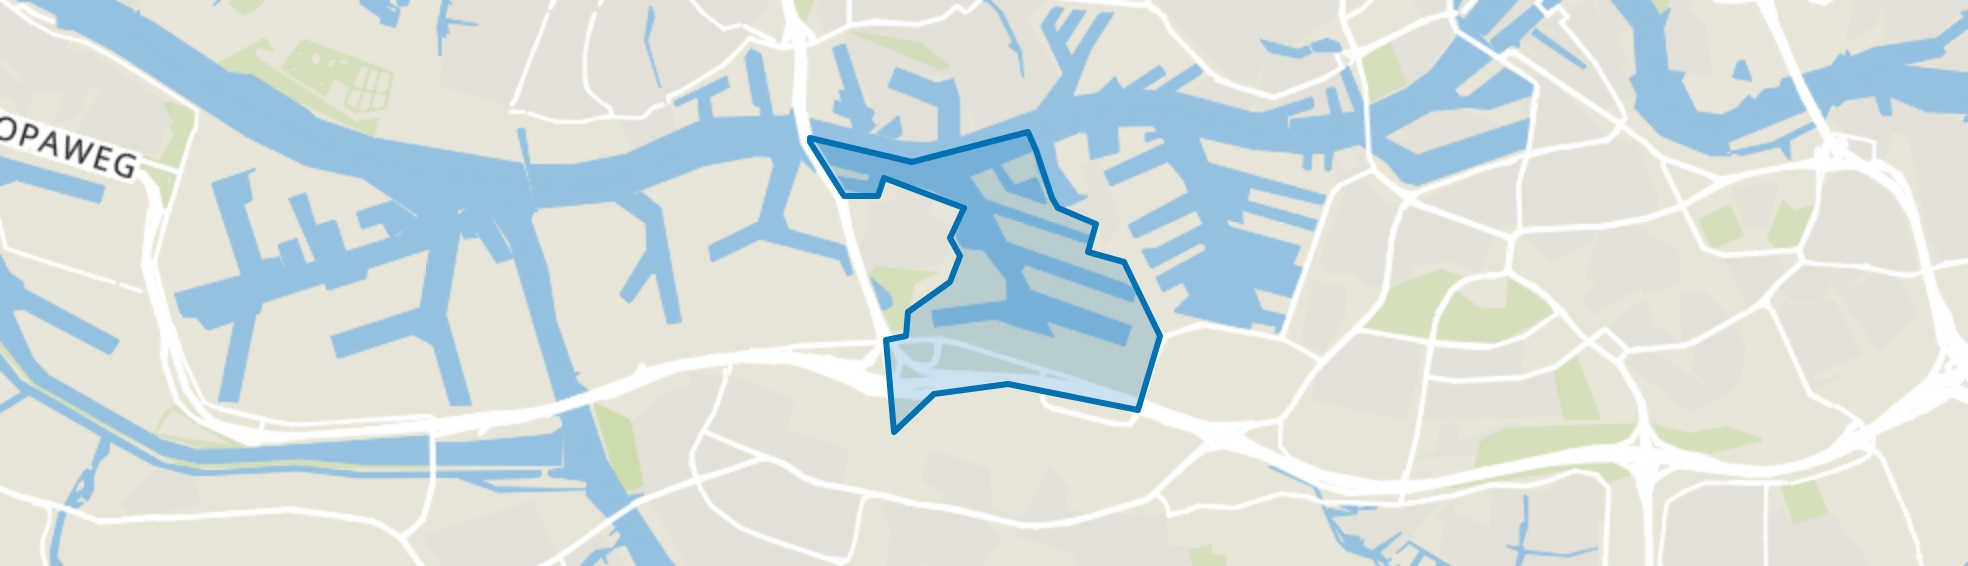 Eemhaven, Rotterdam map